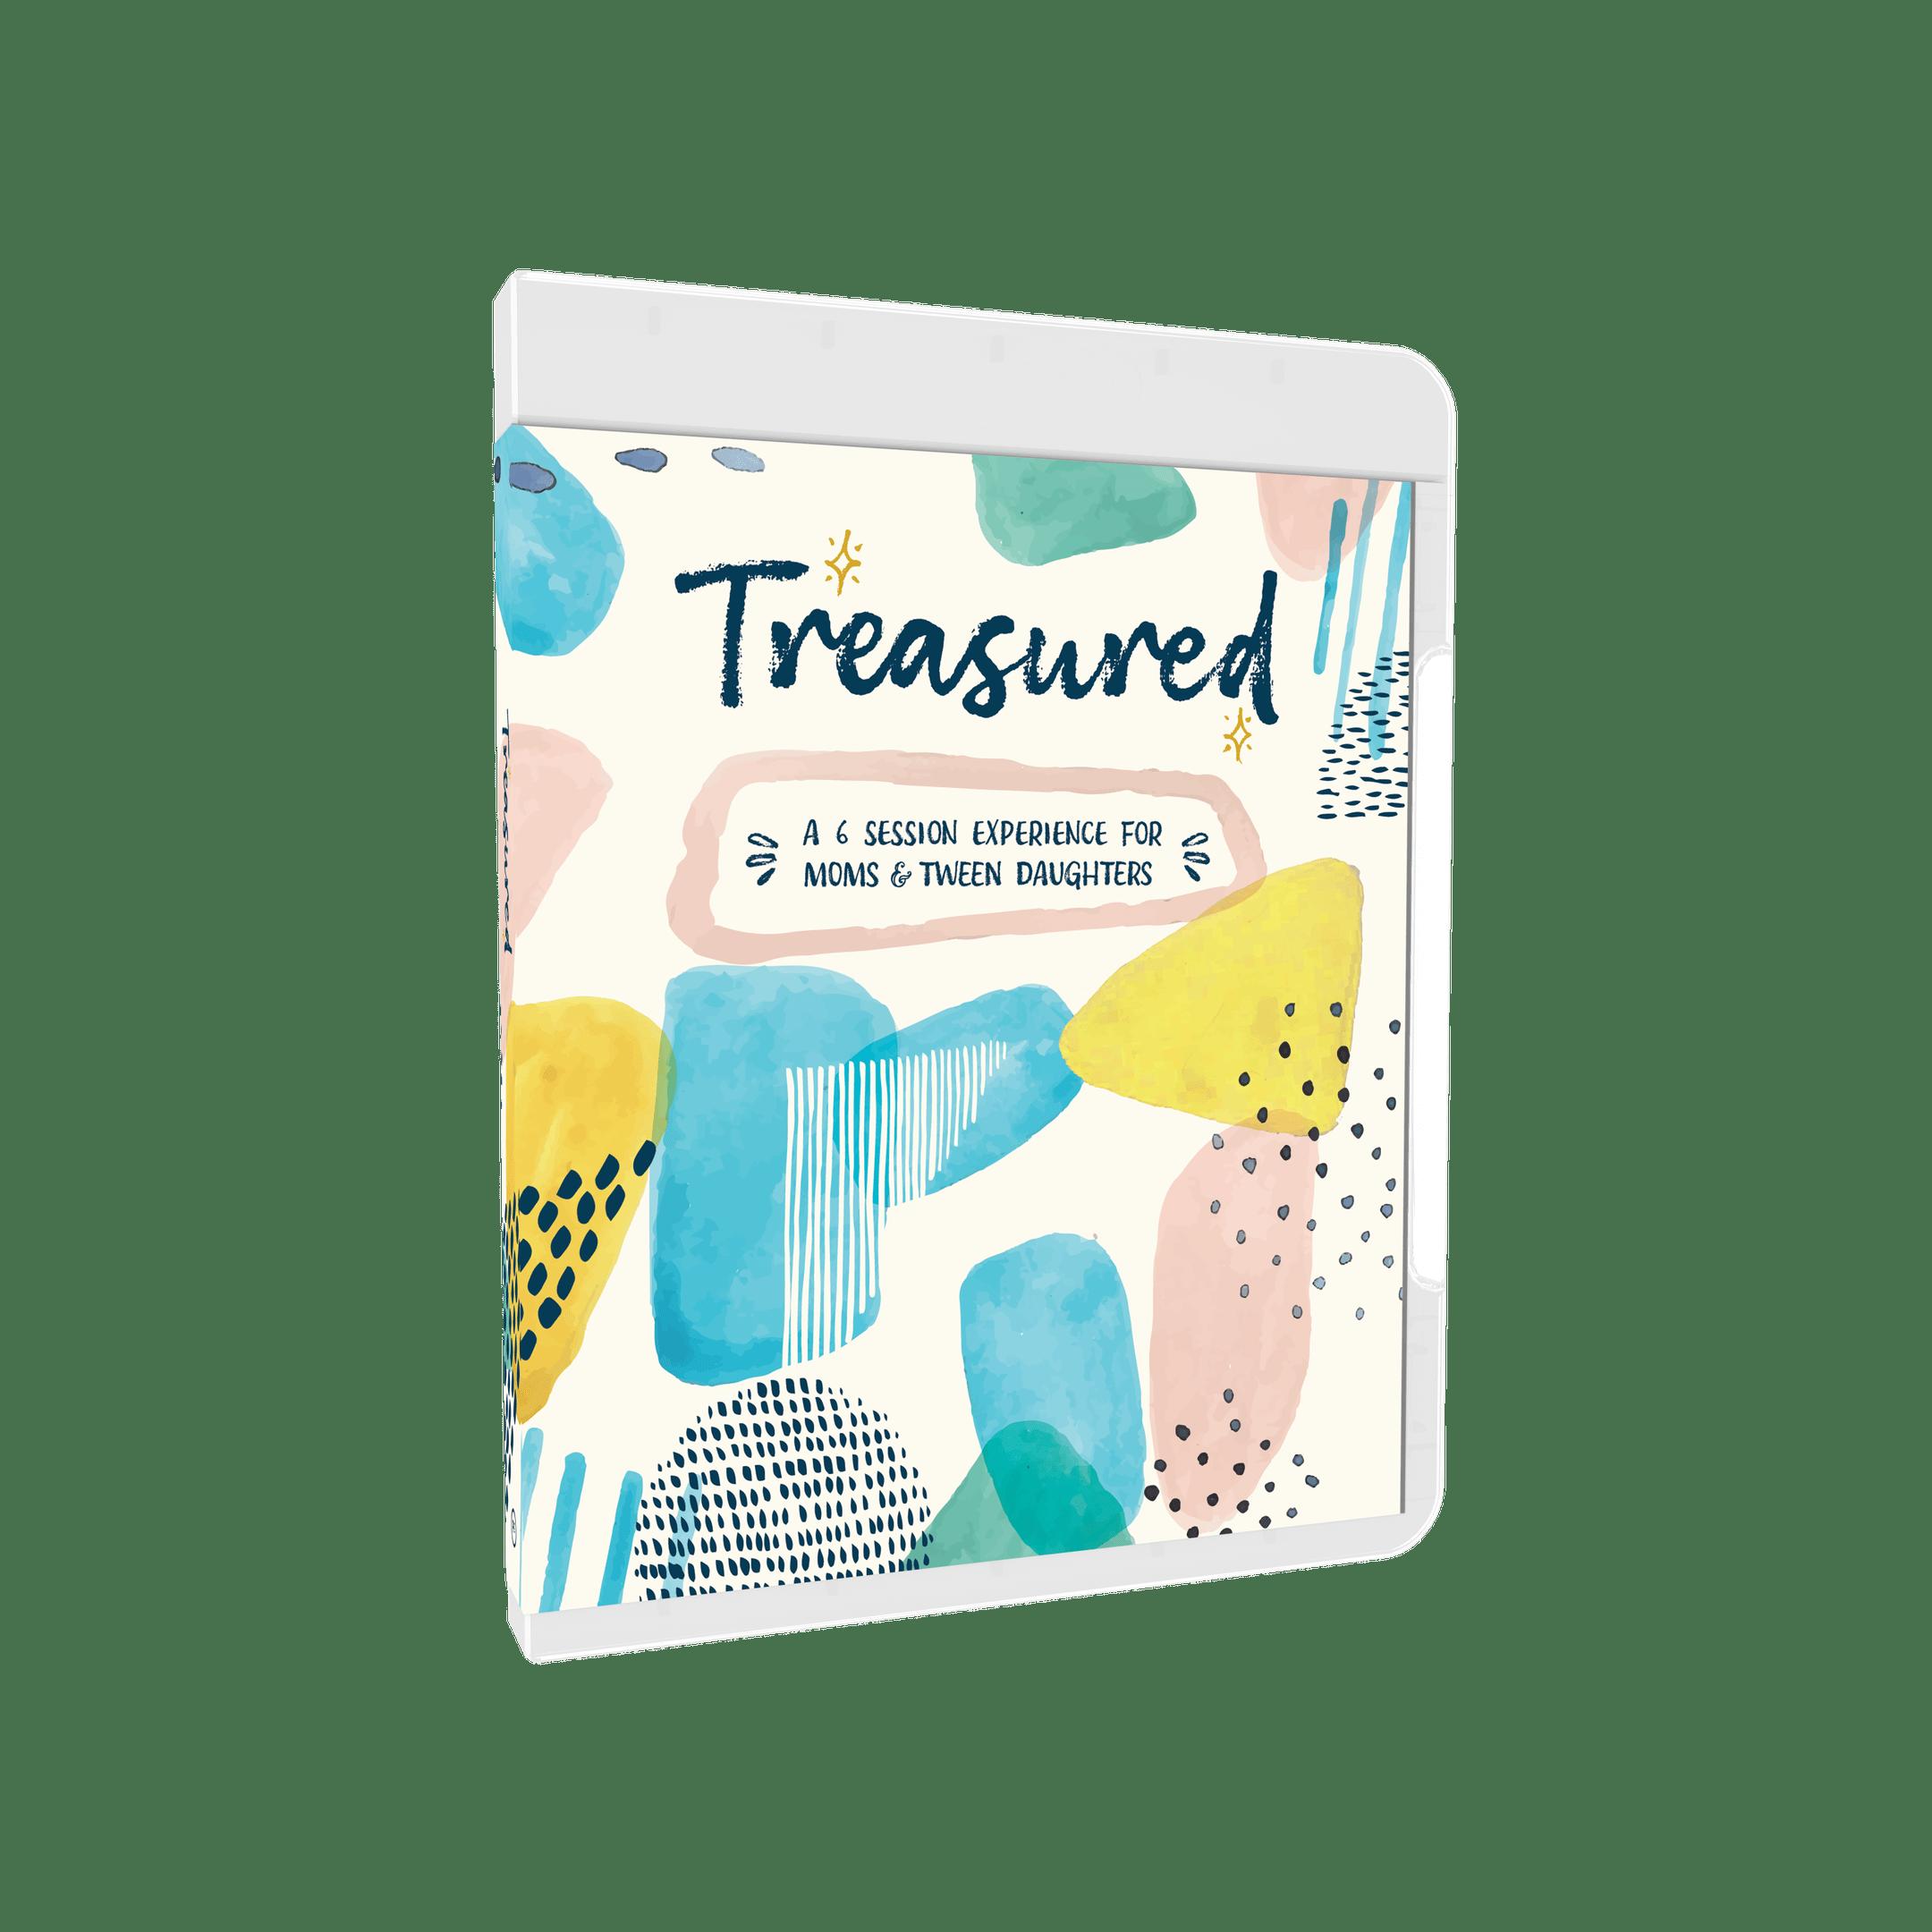 Treasured_DVD_1